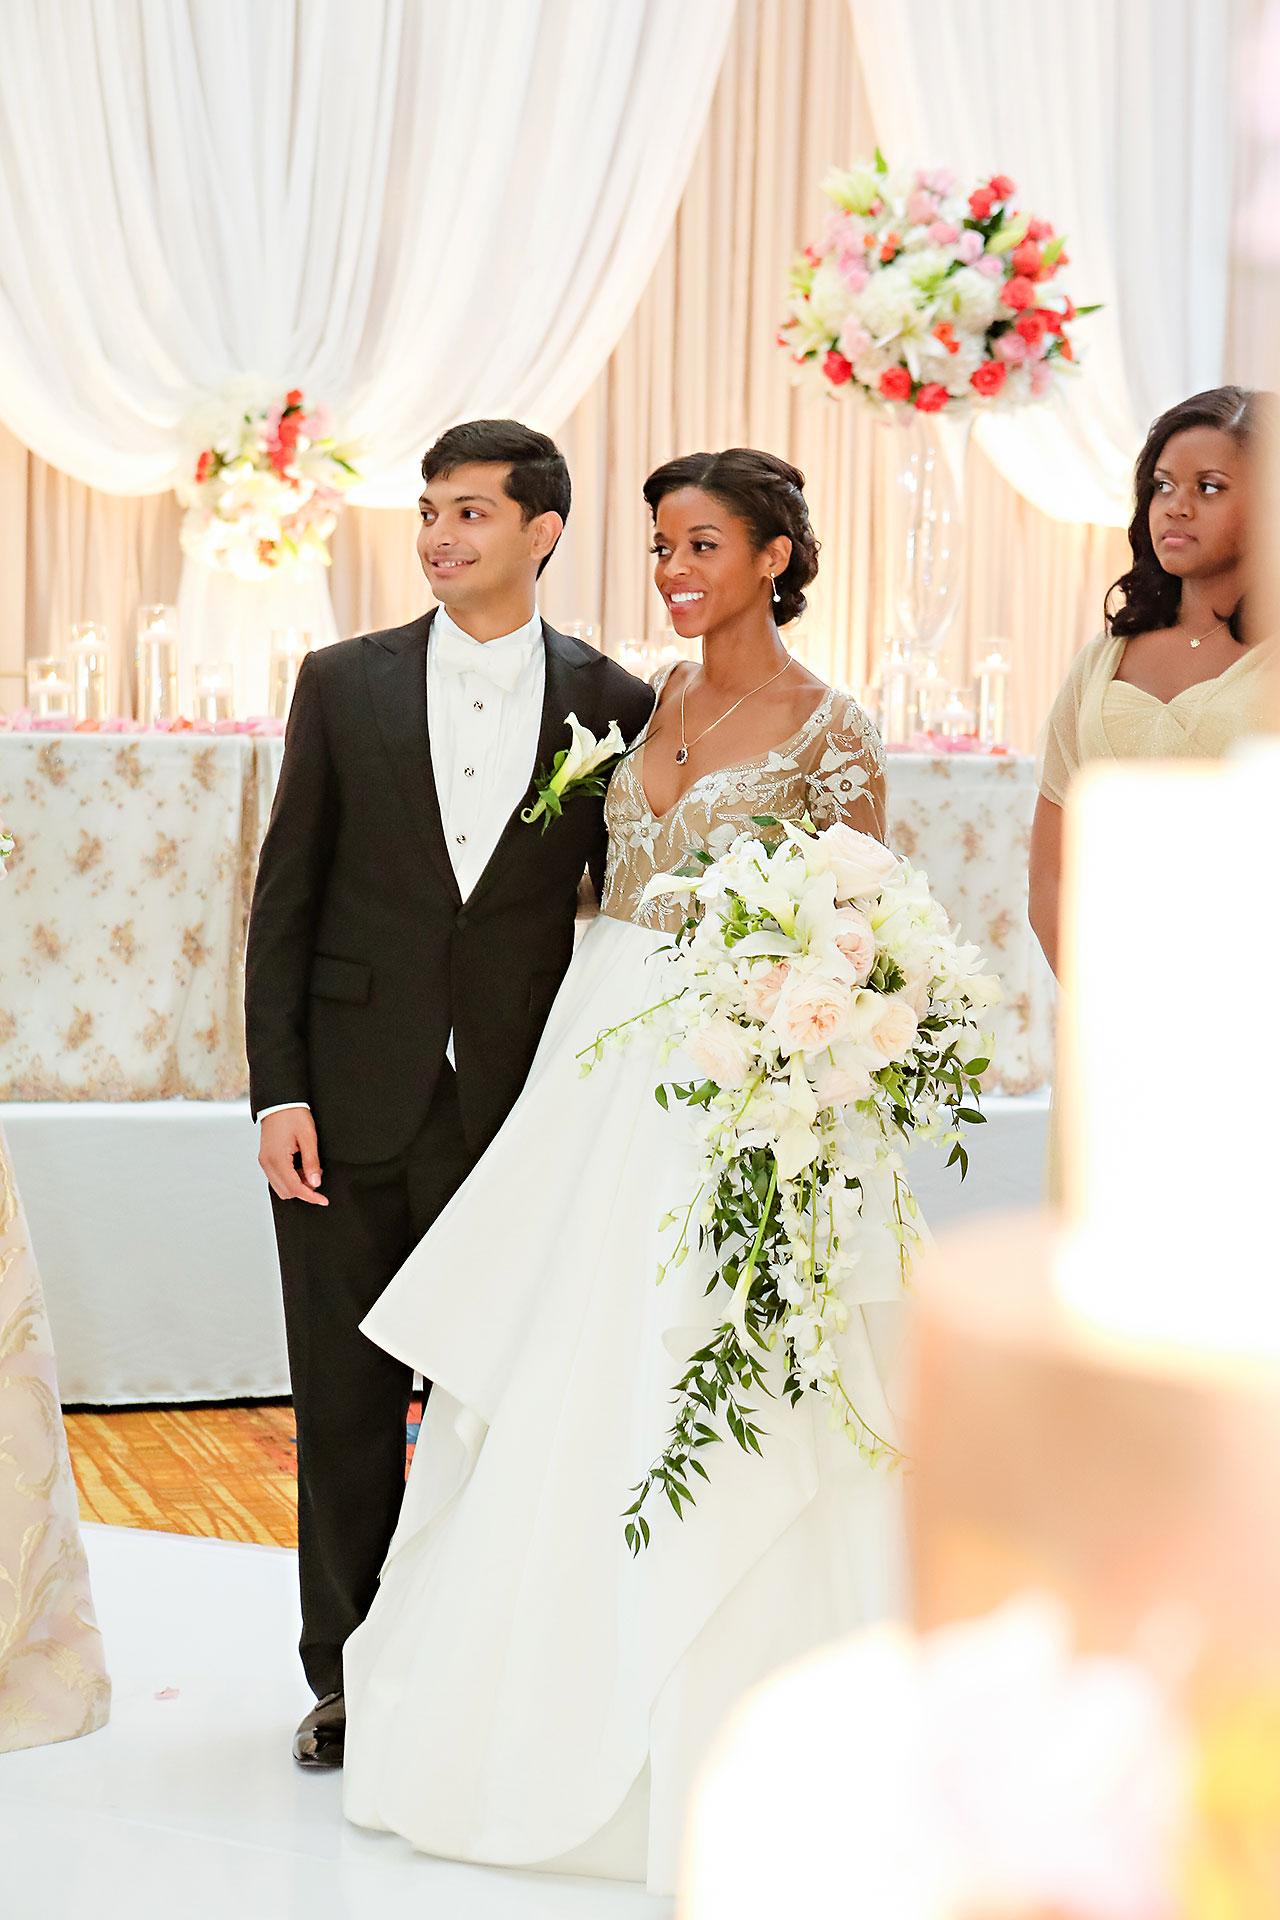 Joie Nikhil JW Marriott Indianapolis Wedding 082